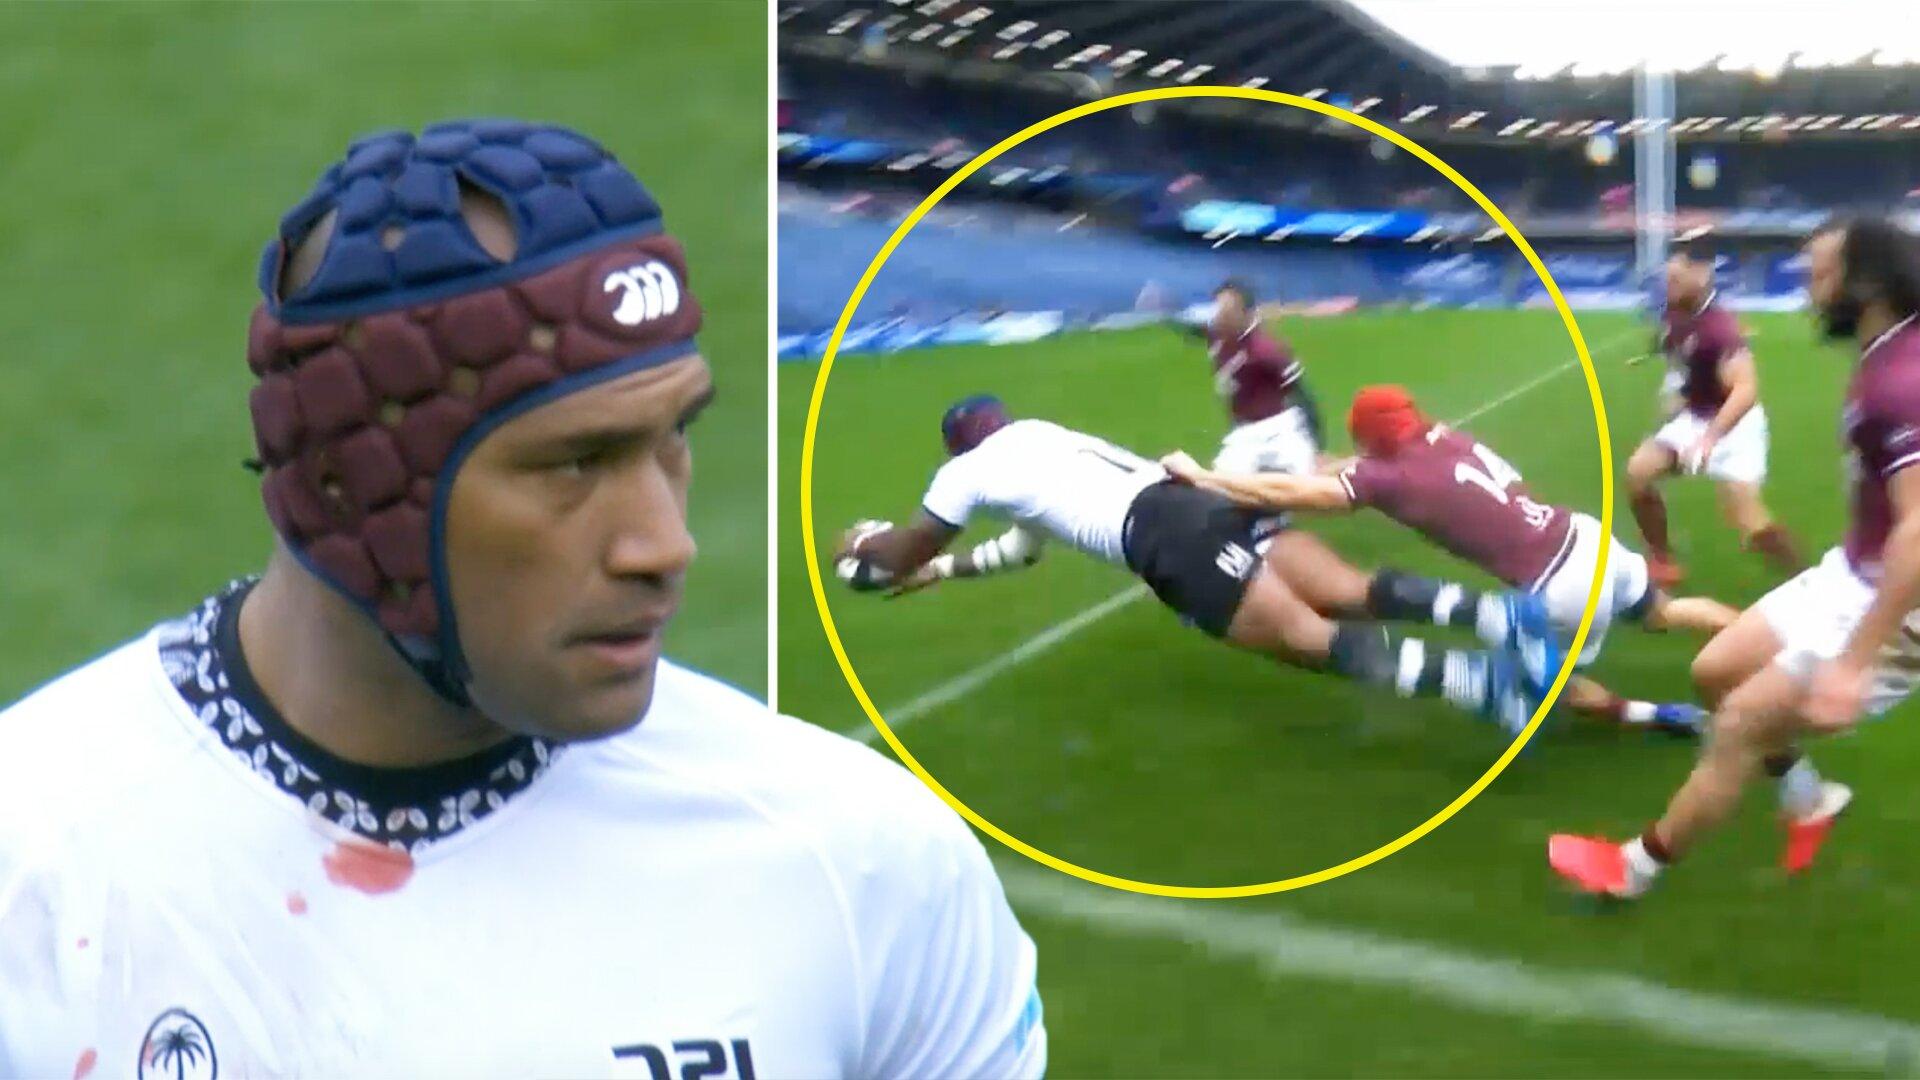 Nemani Nadolo takes 72 seconds to score as Fiji terrorise Georgian defence